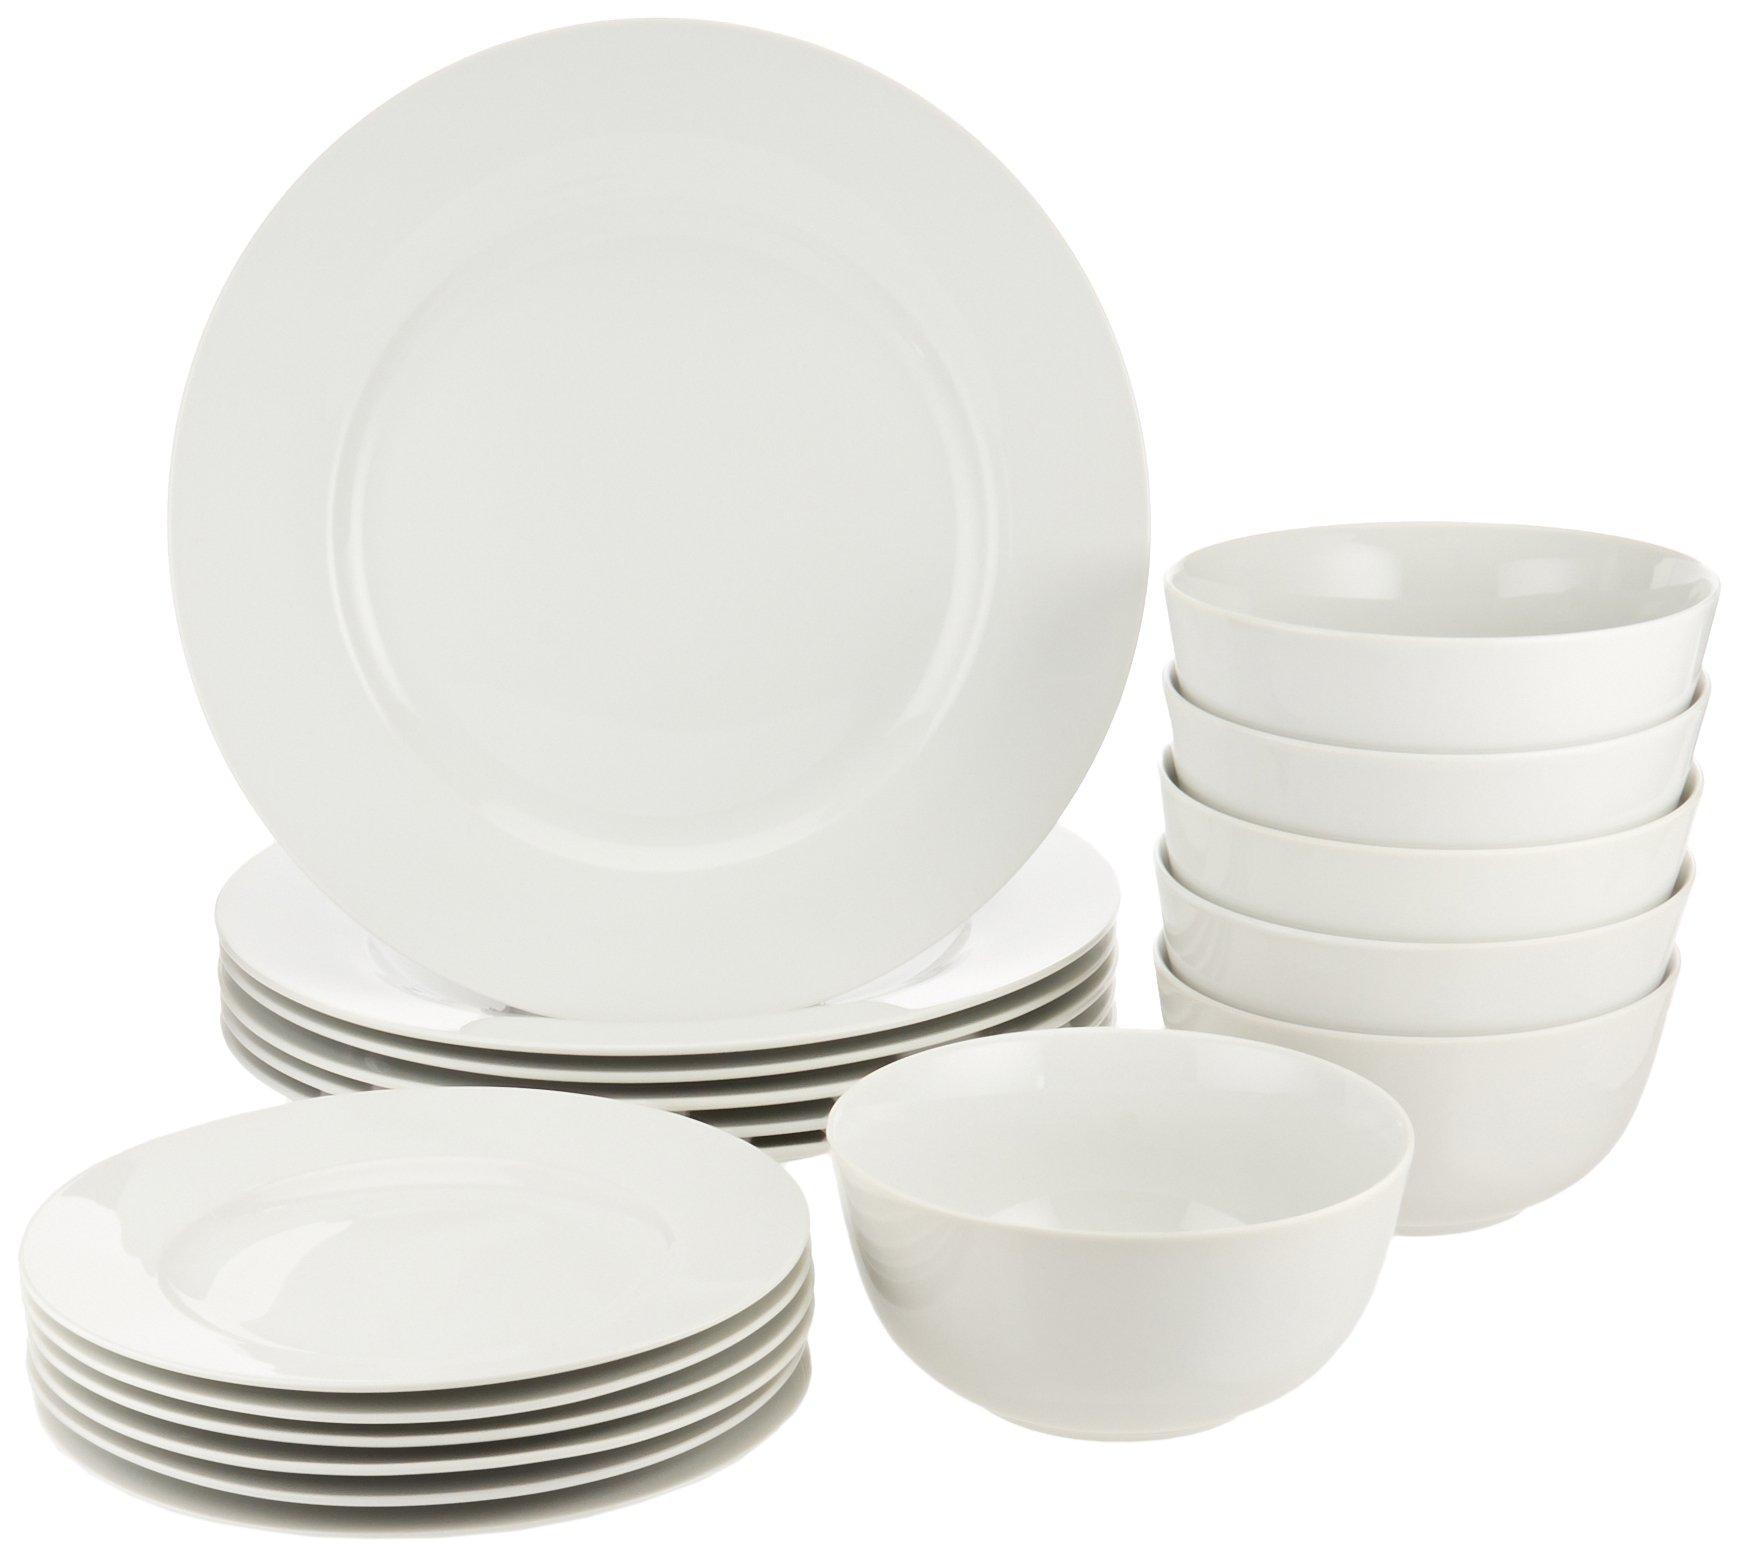 AmazonBasics 18-Piece White Kitchen Dinnerware Set, Dishes, Bowls, Service for 6 by AmazonBasics